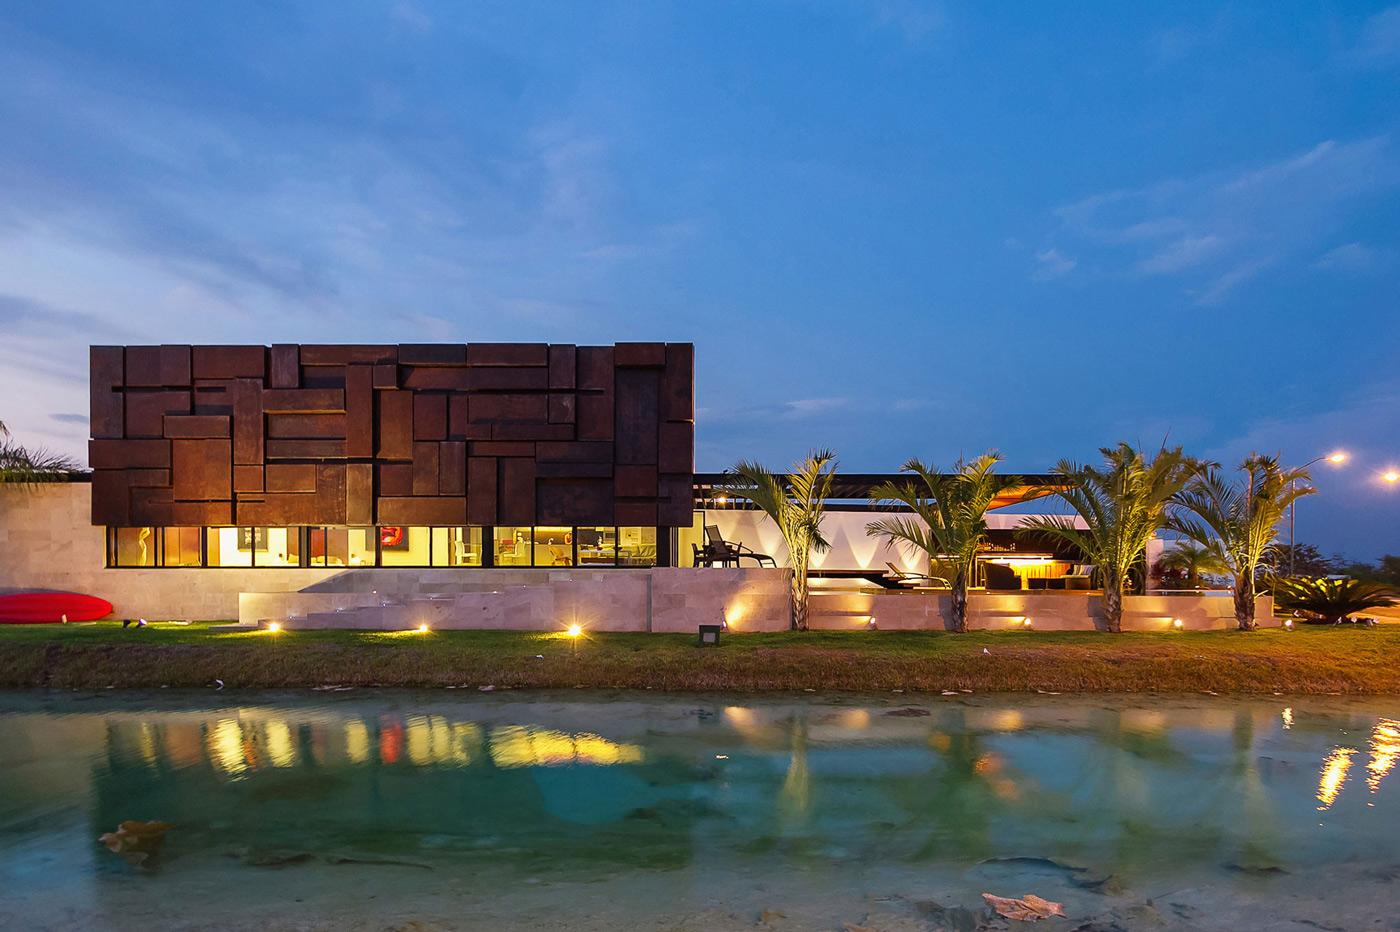 Evening, Lighting, River, Contemporary Residence in Merida, Yucatan